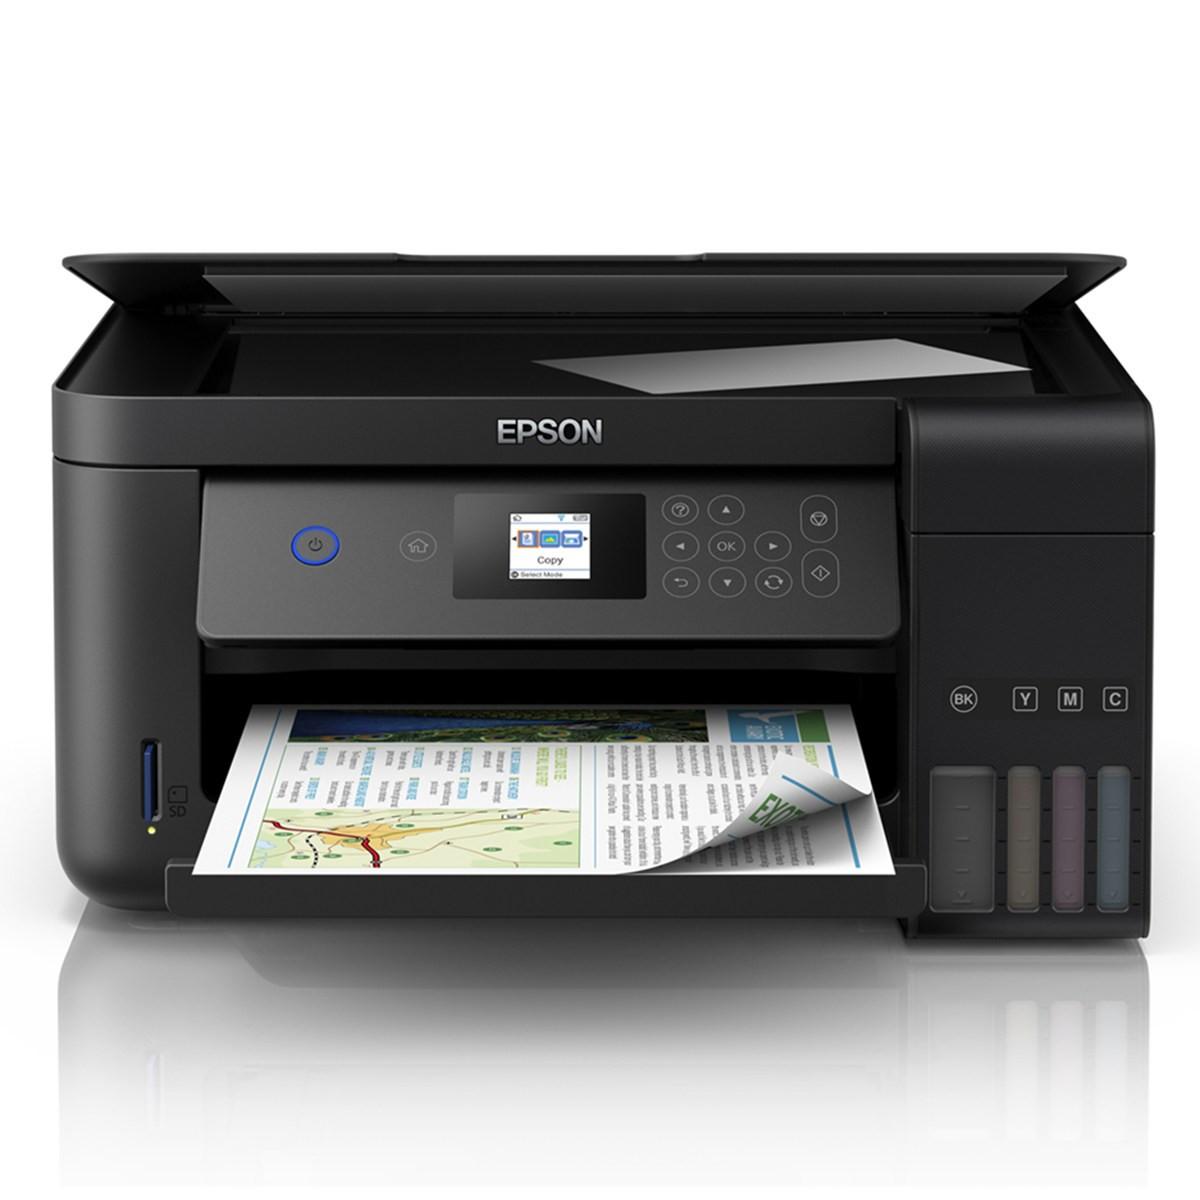 Impressora Epson L4160 | Multifuncional Tanque de Tinta com Wireless e Duplex